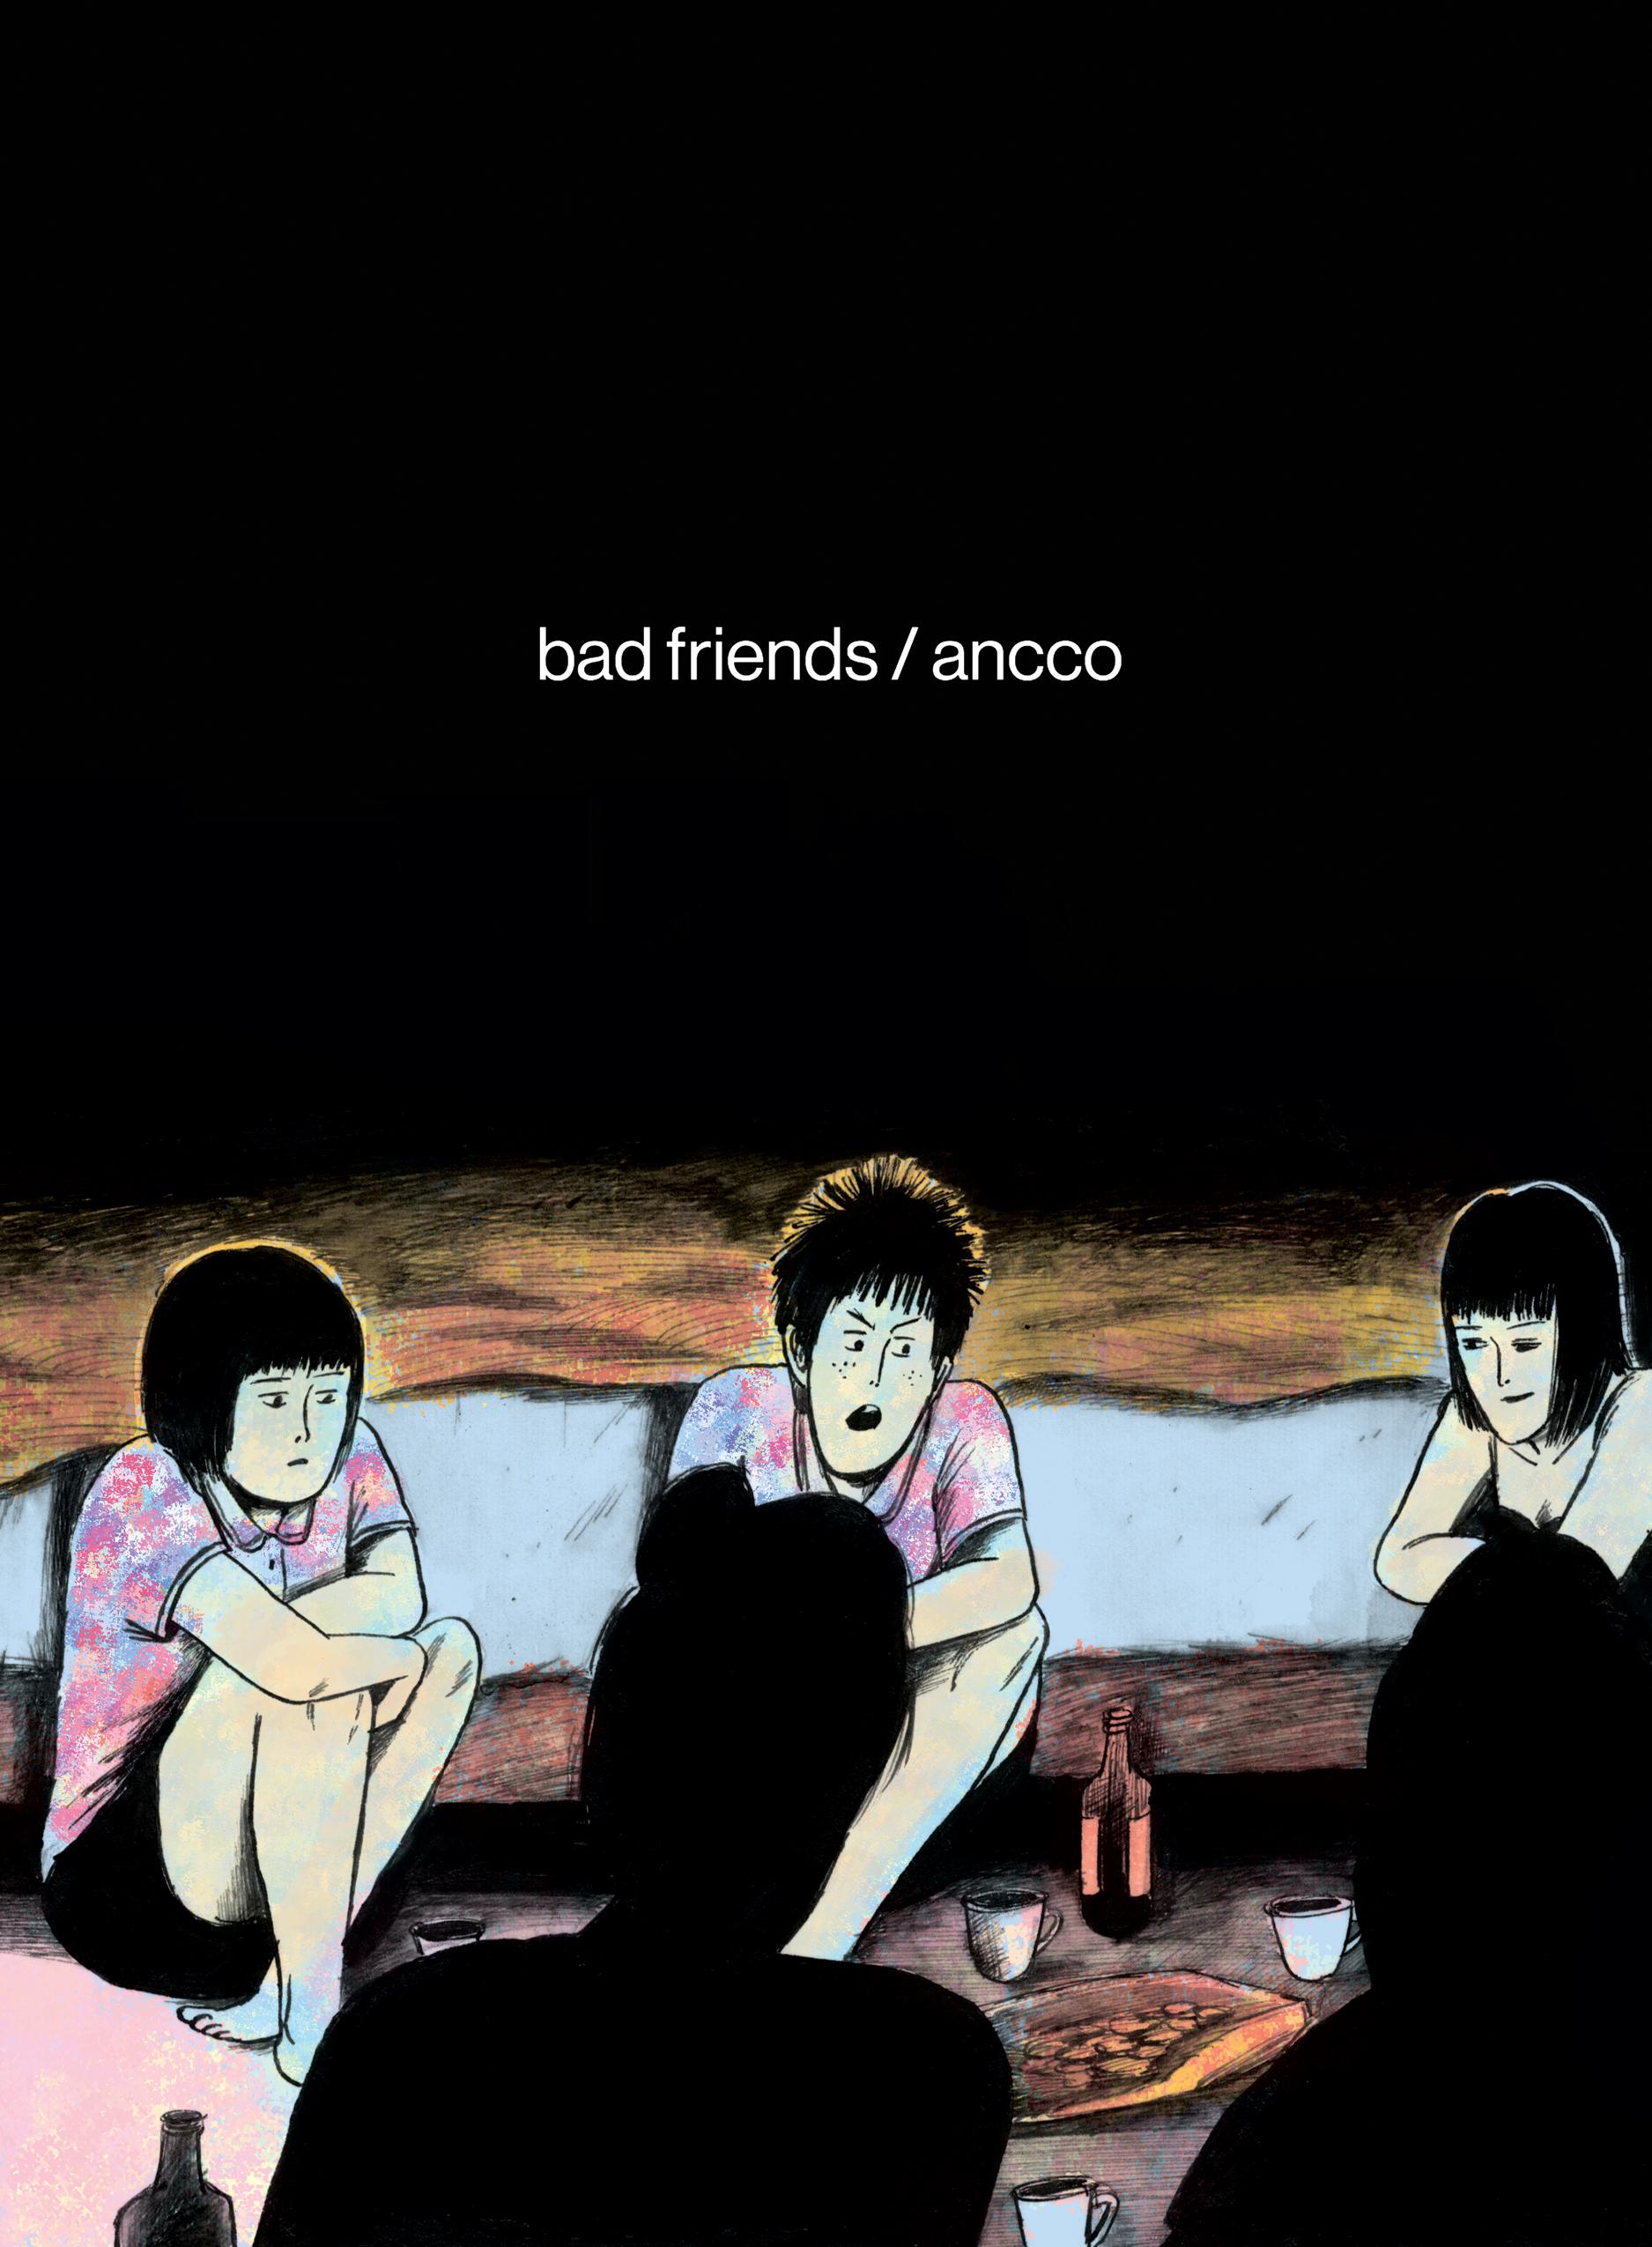 badfriendscover.jpg